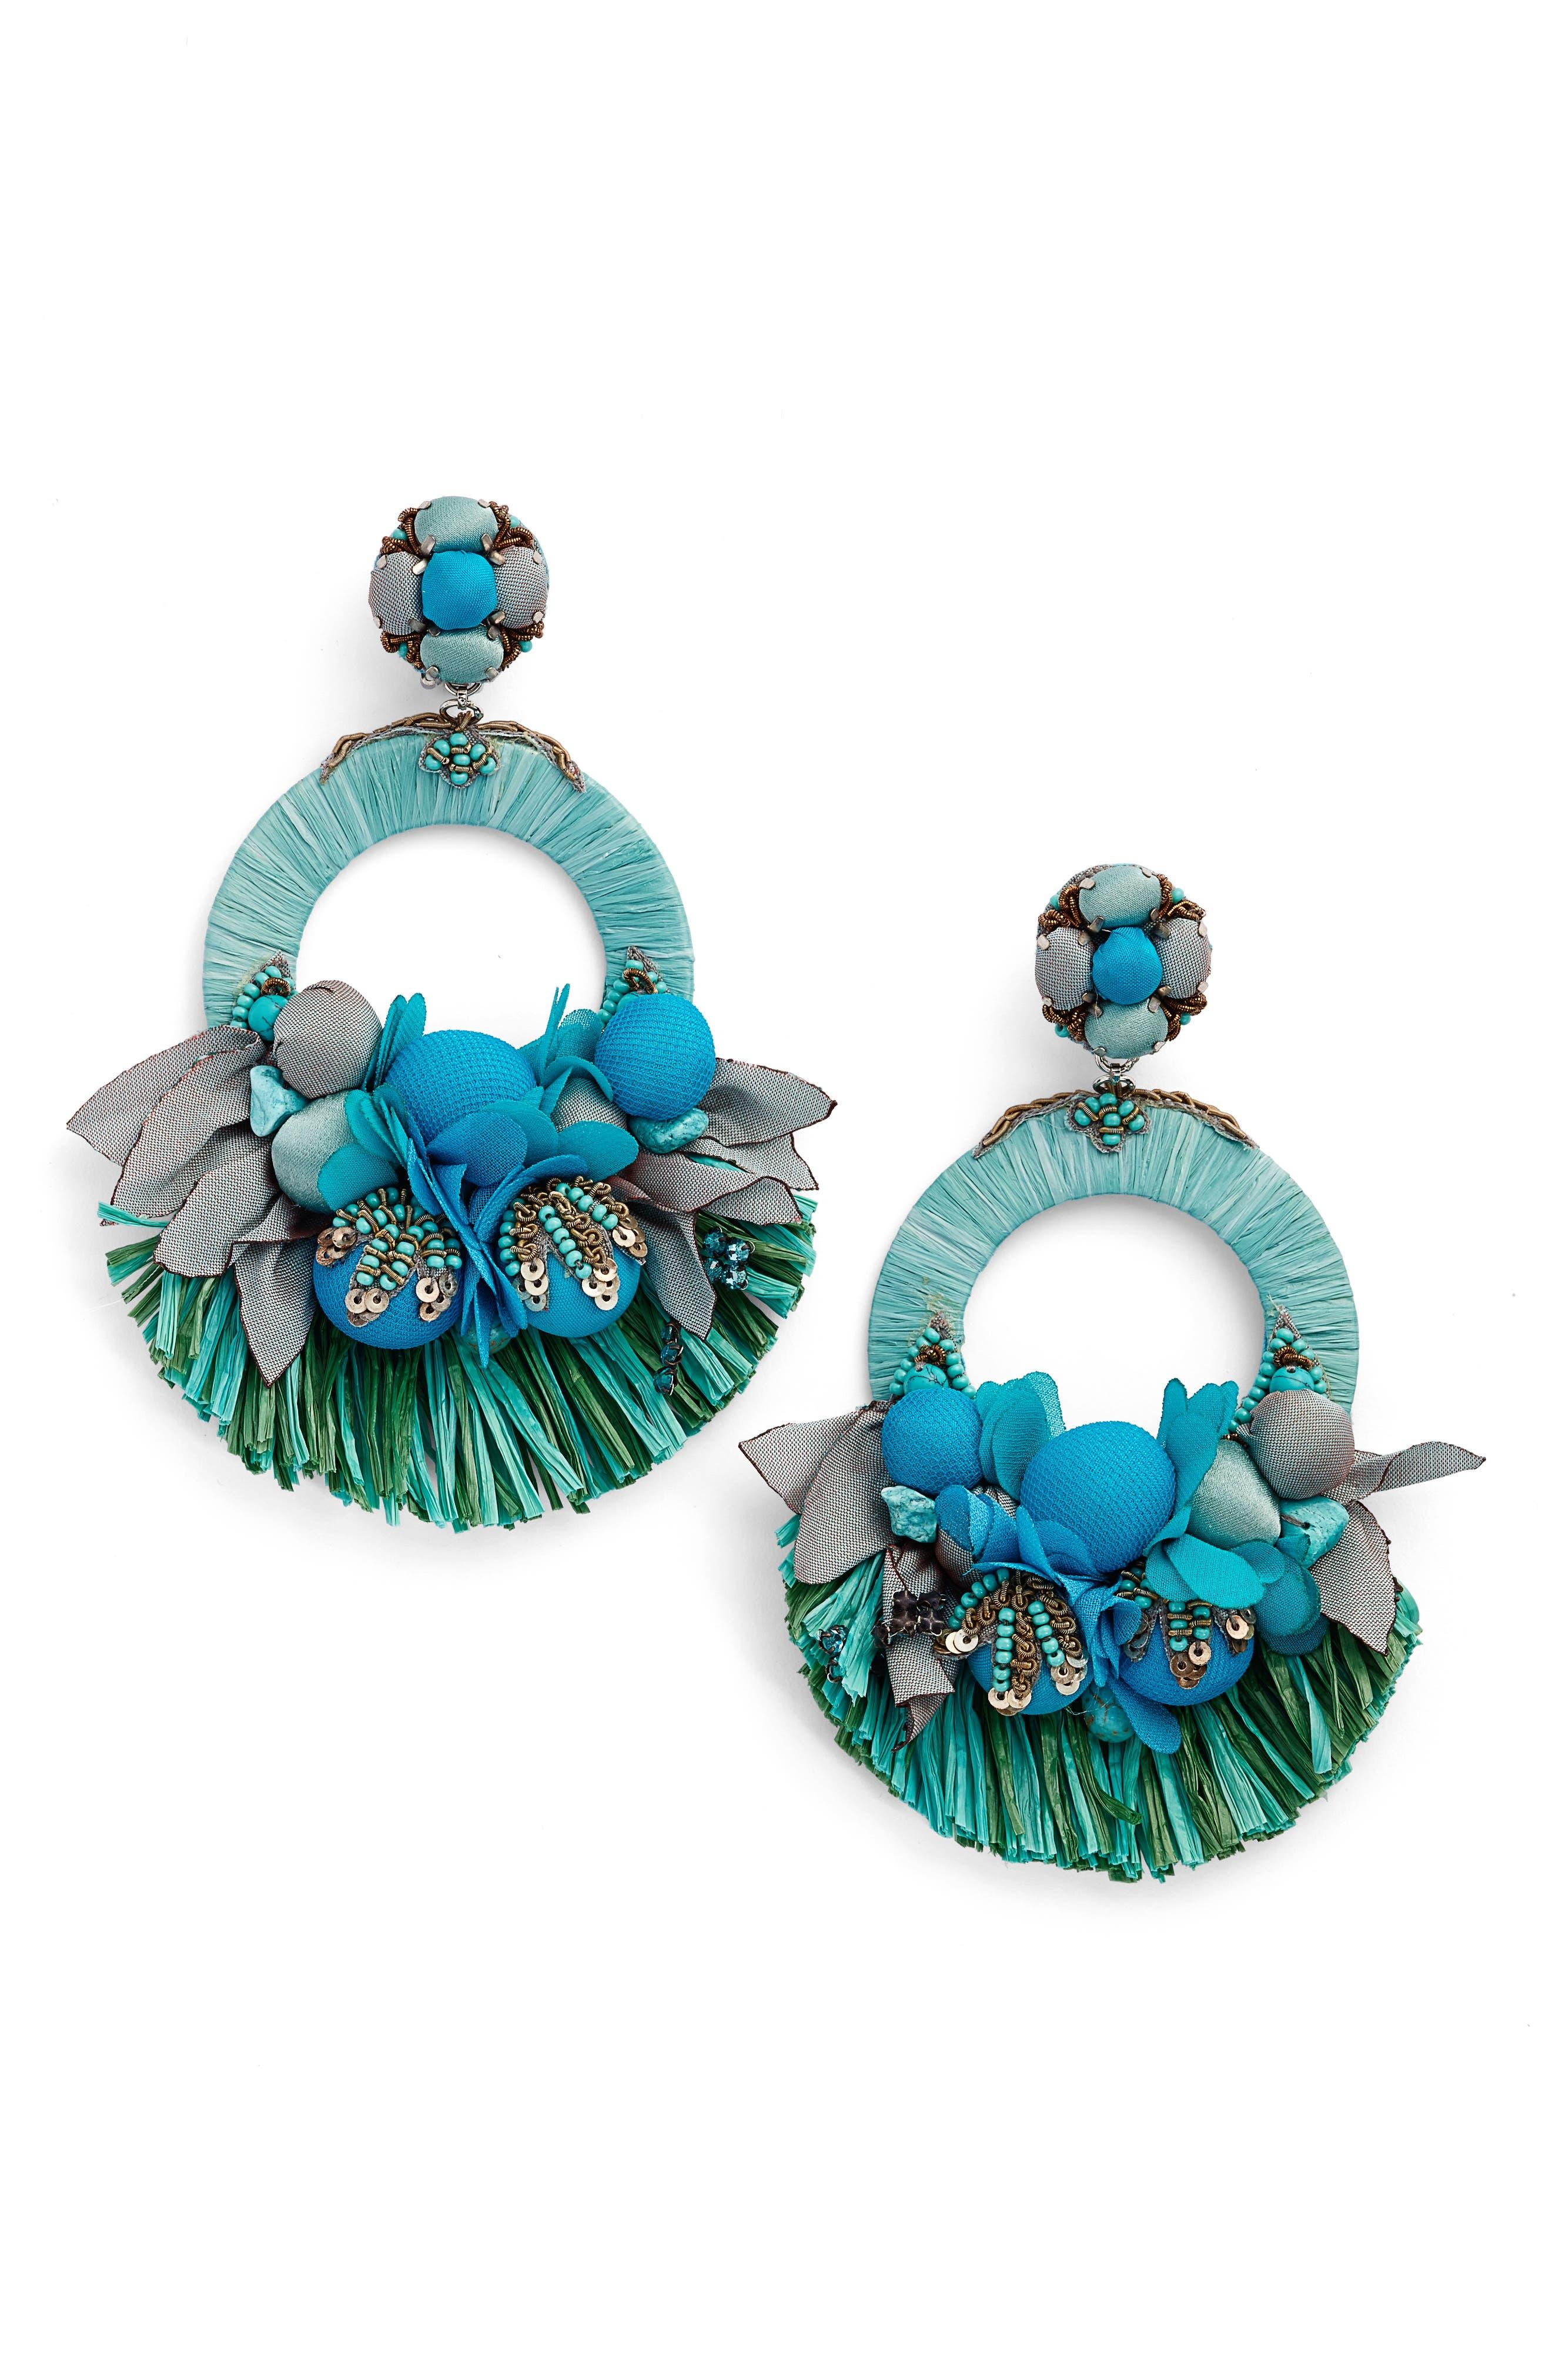 Waverly Drop Earrings,                             Main thumbnail 1, color,                             Blue / Green